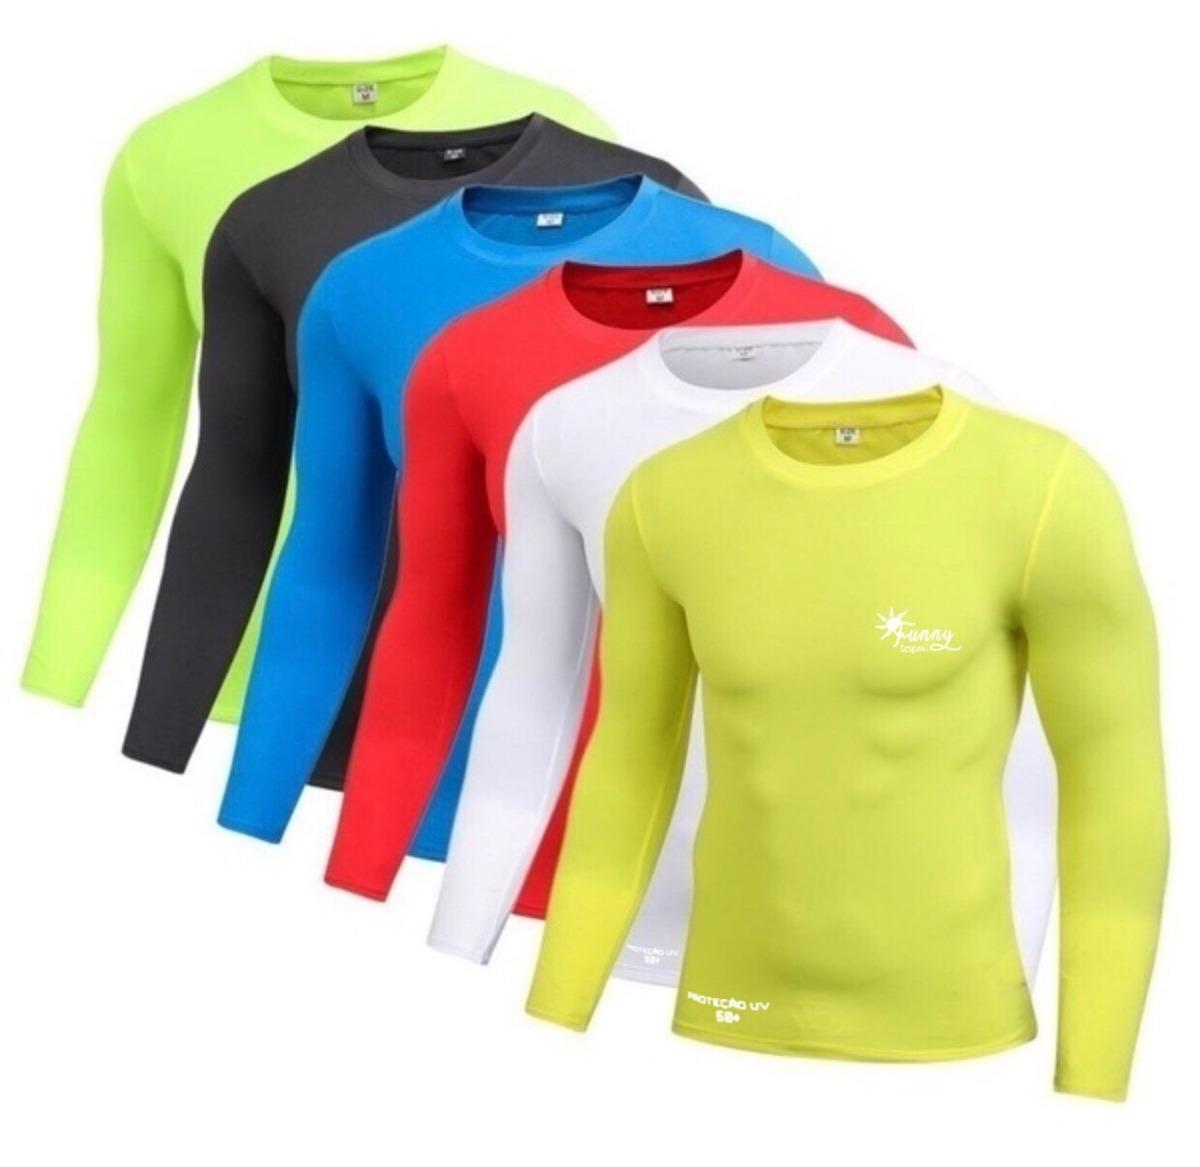 c414b814fa kit 8 camisa proteção solar uv slim fitness blusa unissex. Carregando zoom.